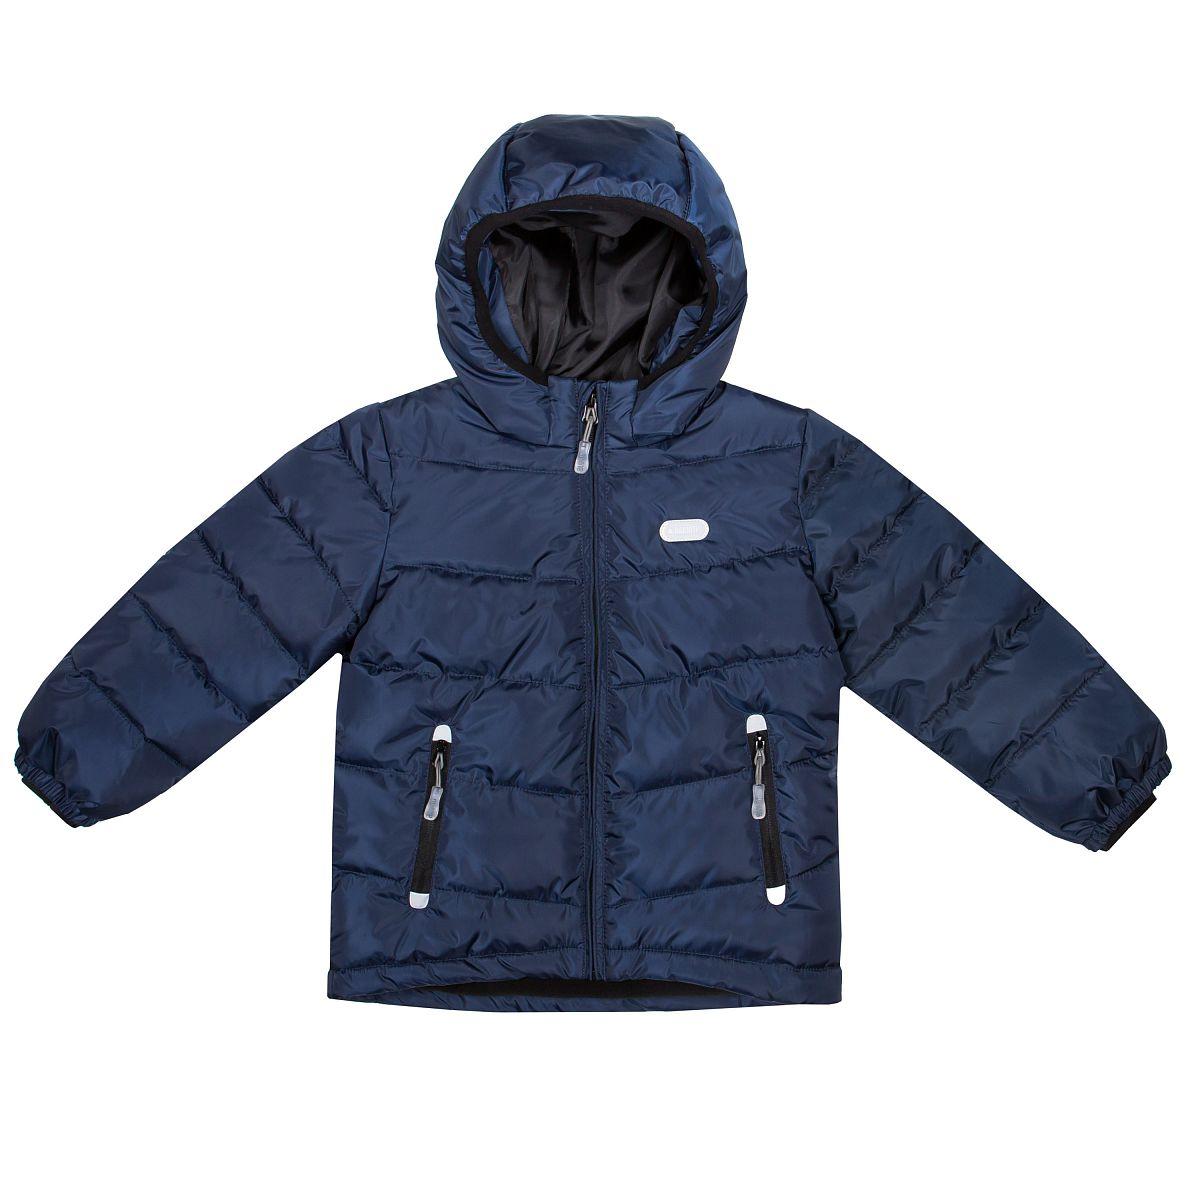 a61b18aba045 Куртка для мальчика Barkito, синяя